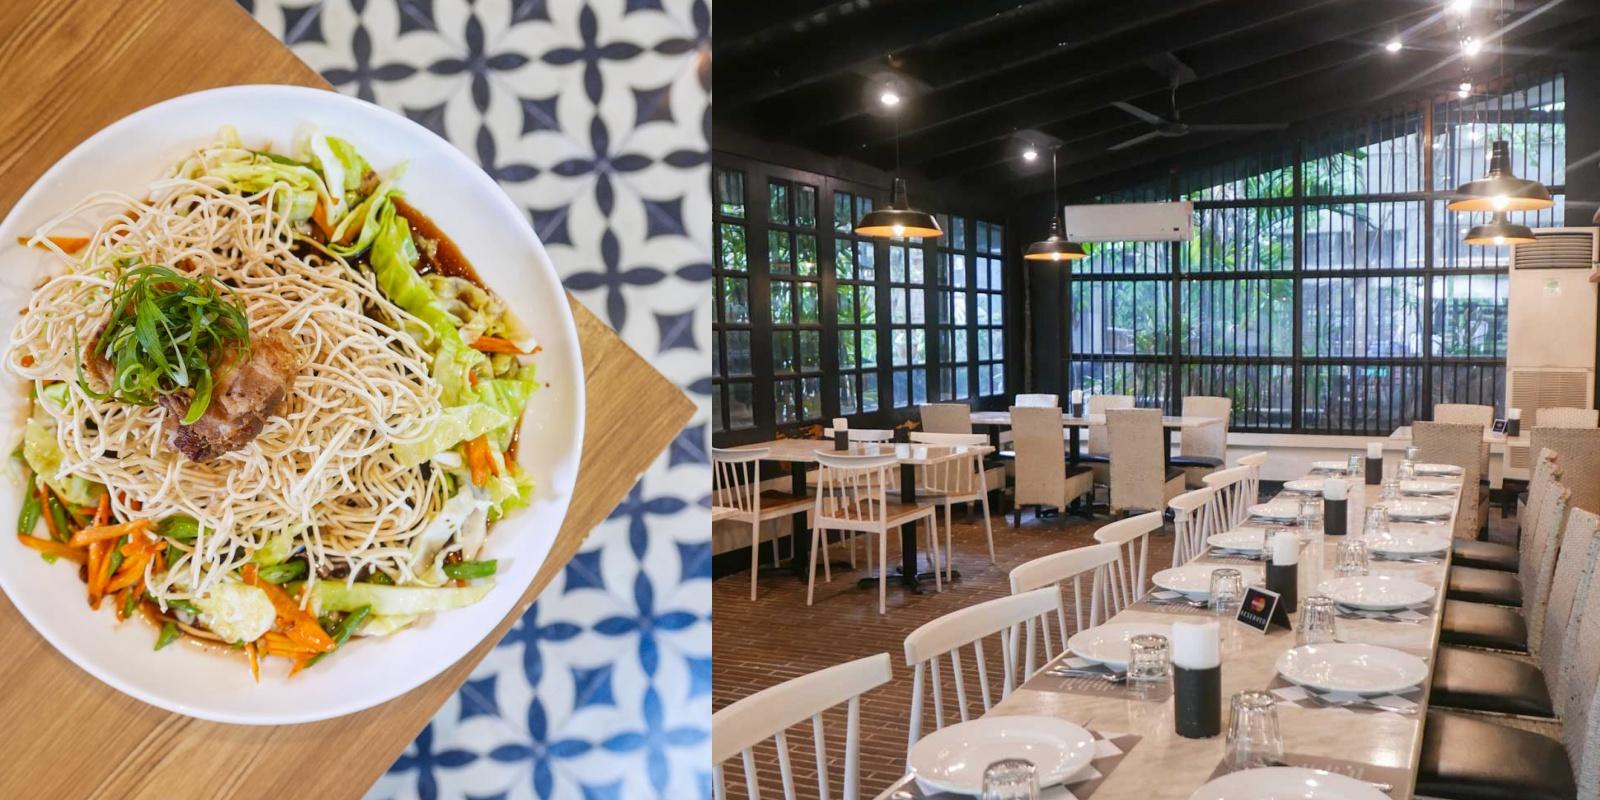 Revisiting Lola Cafe, one of QC's hidden restaurant gems